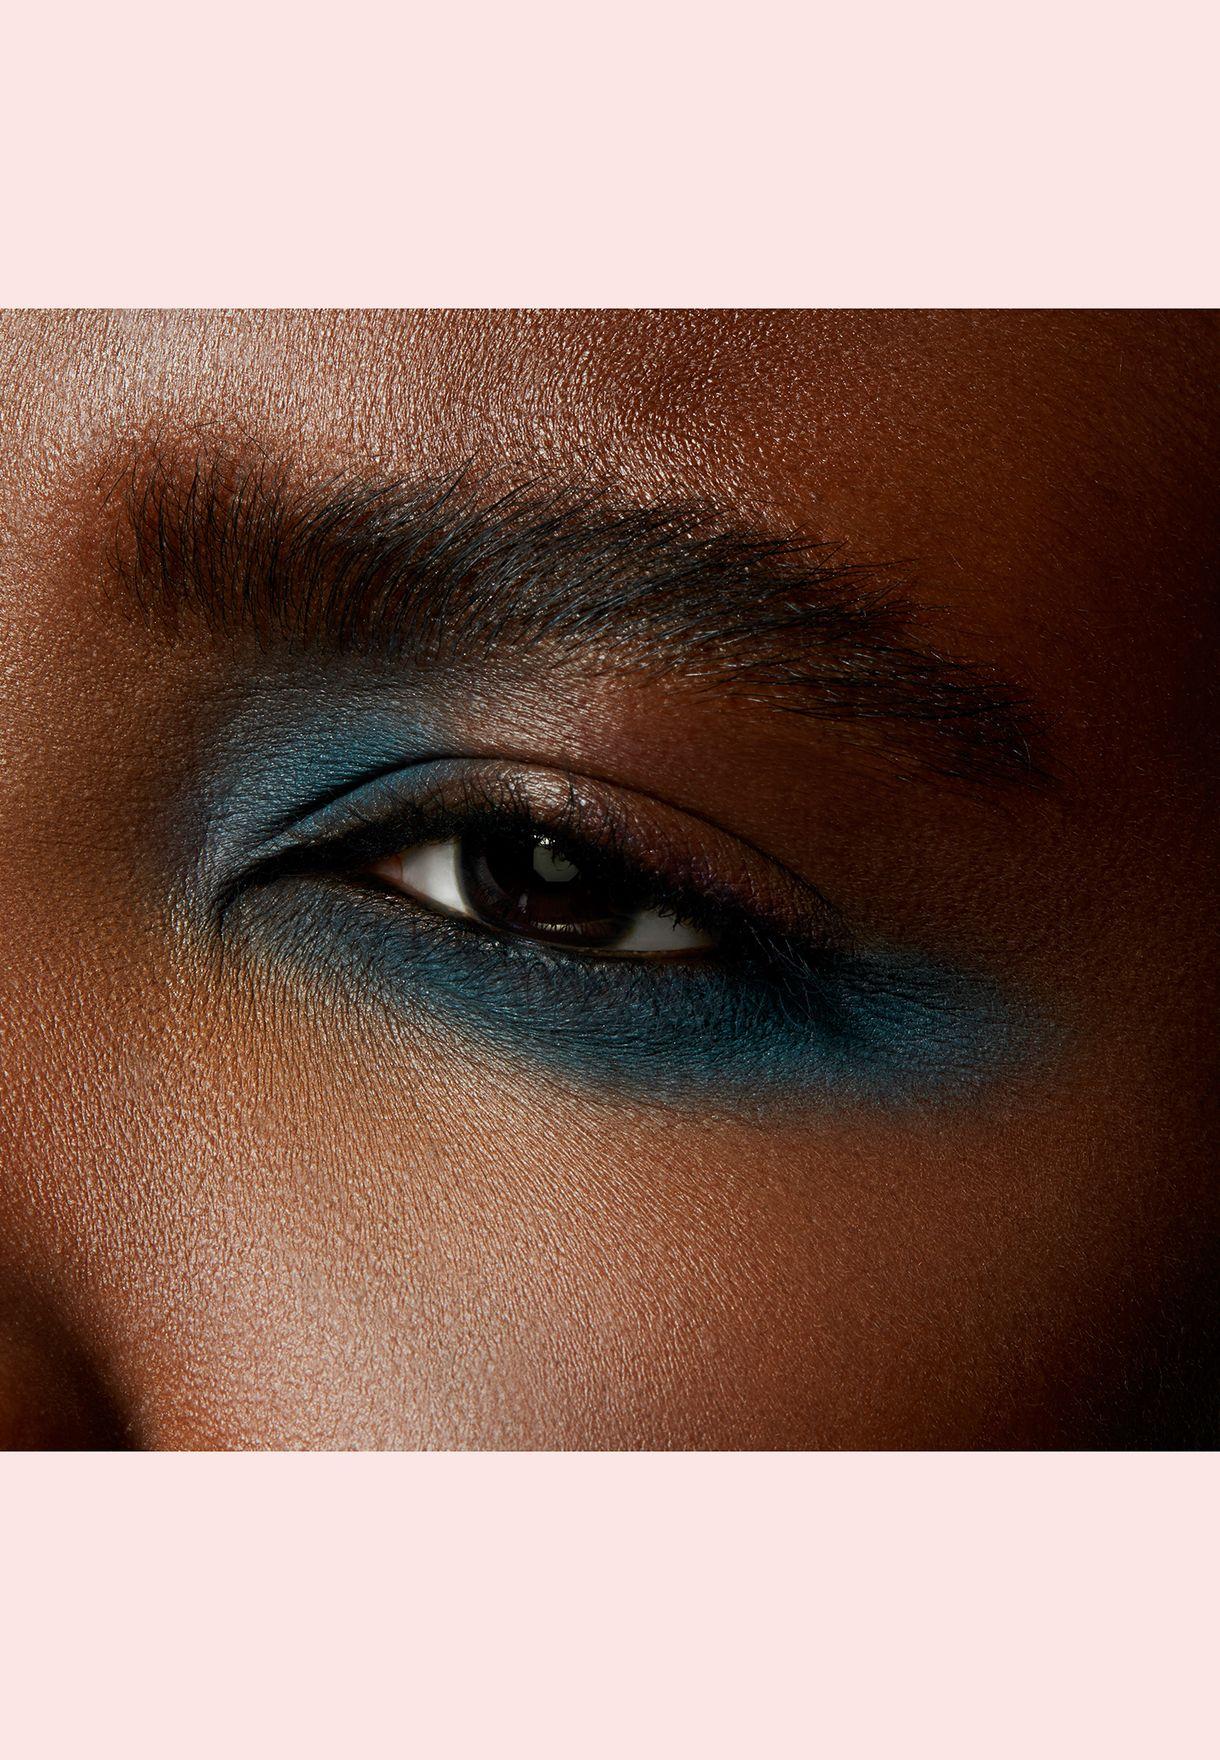 ظلال عين باودر كيس - جود جينز